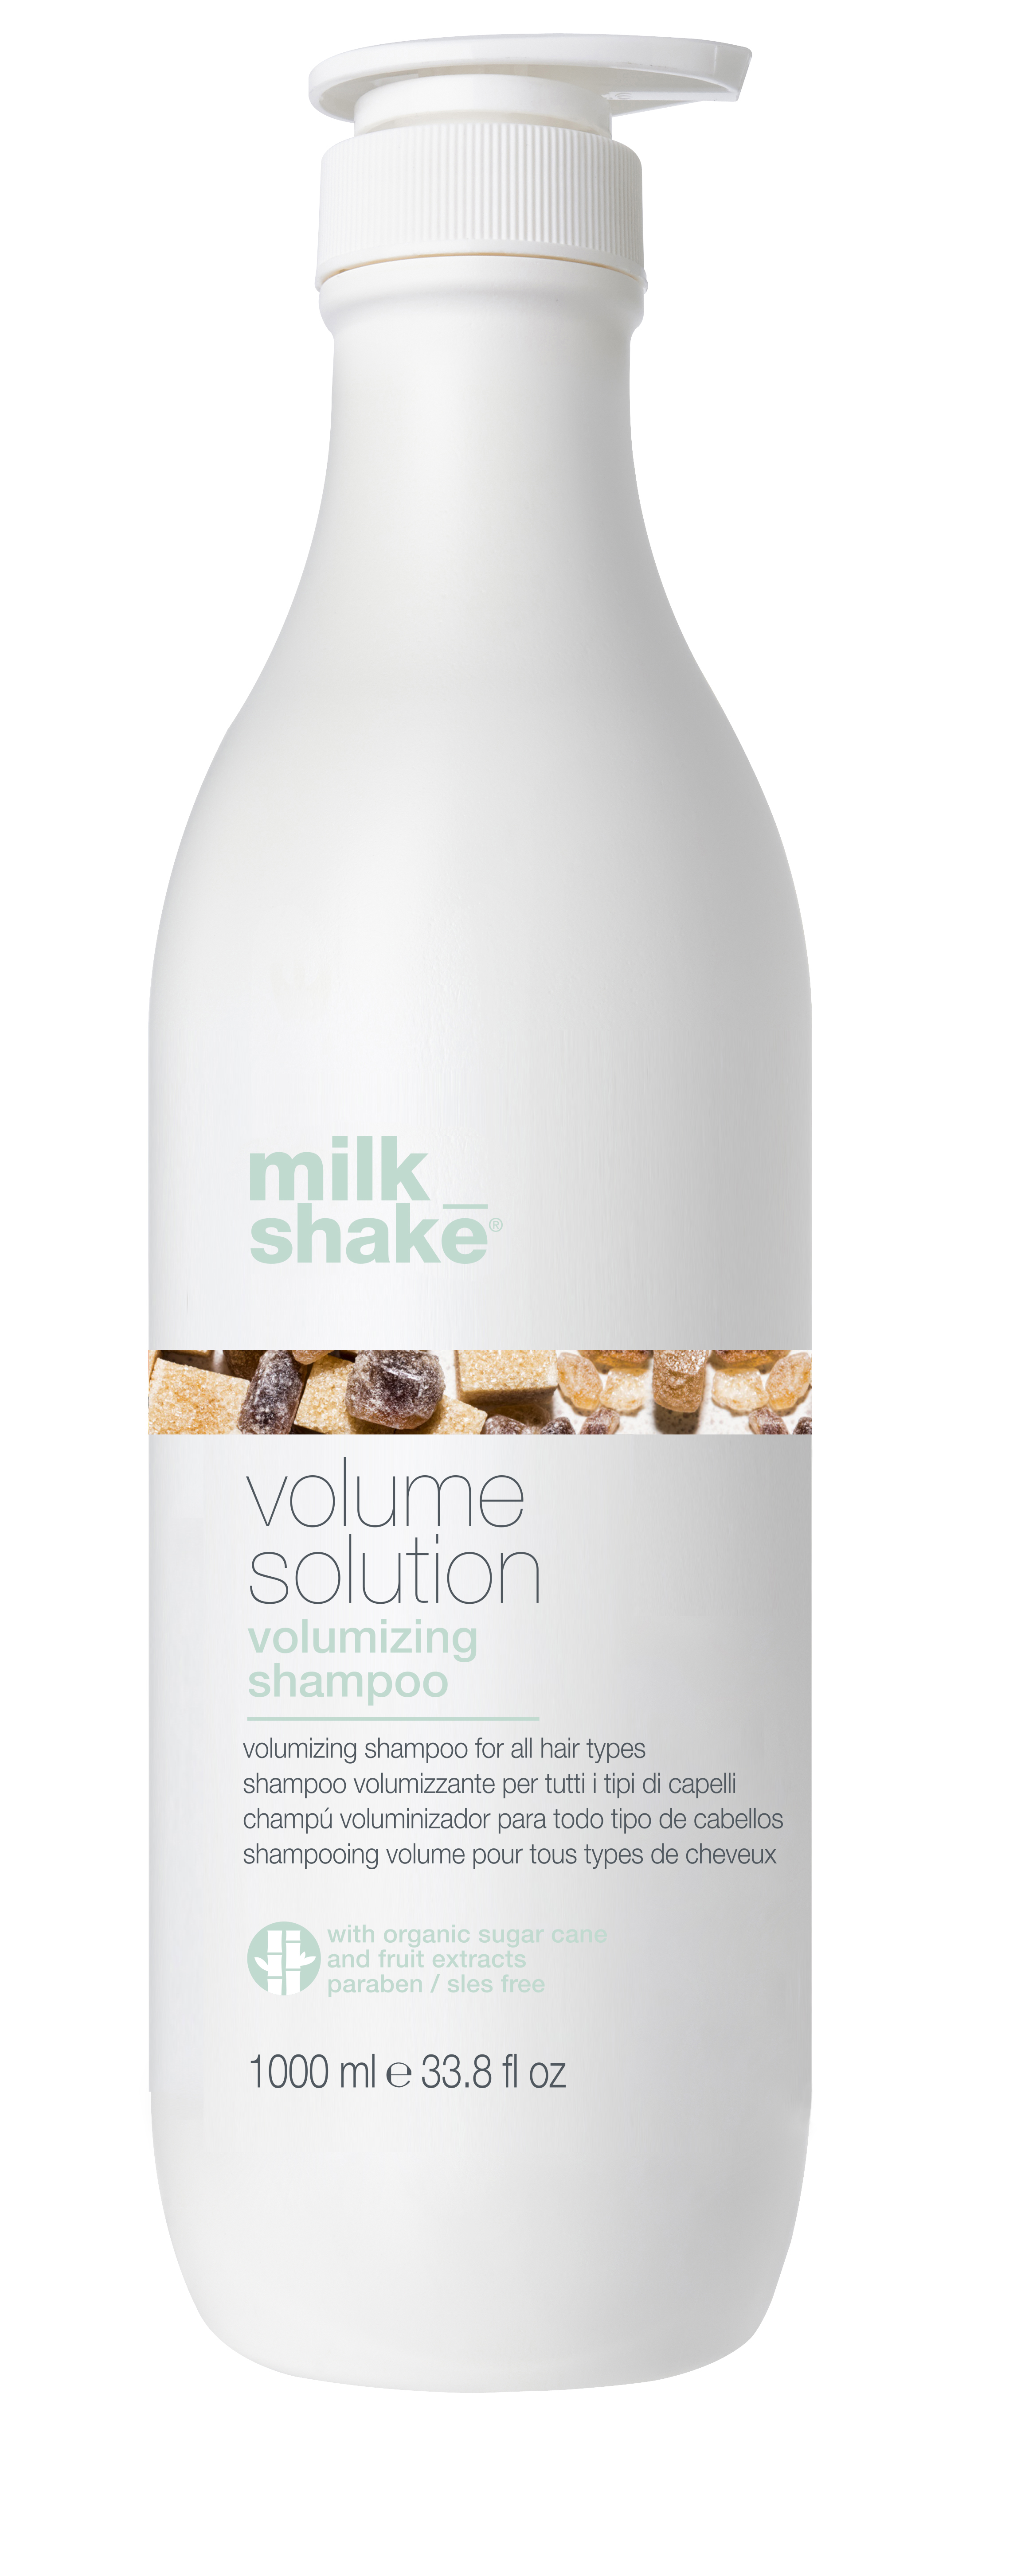 milk_shake - Volume Shampoo 1000 ml